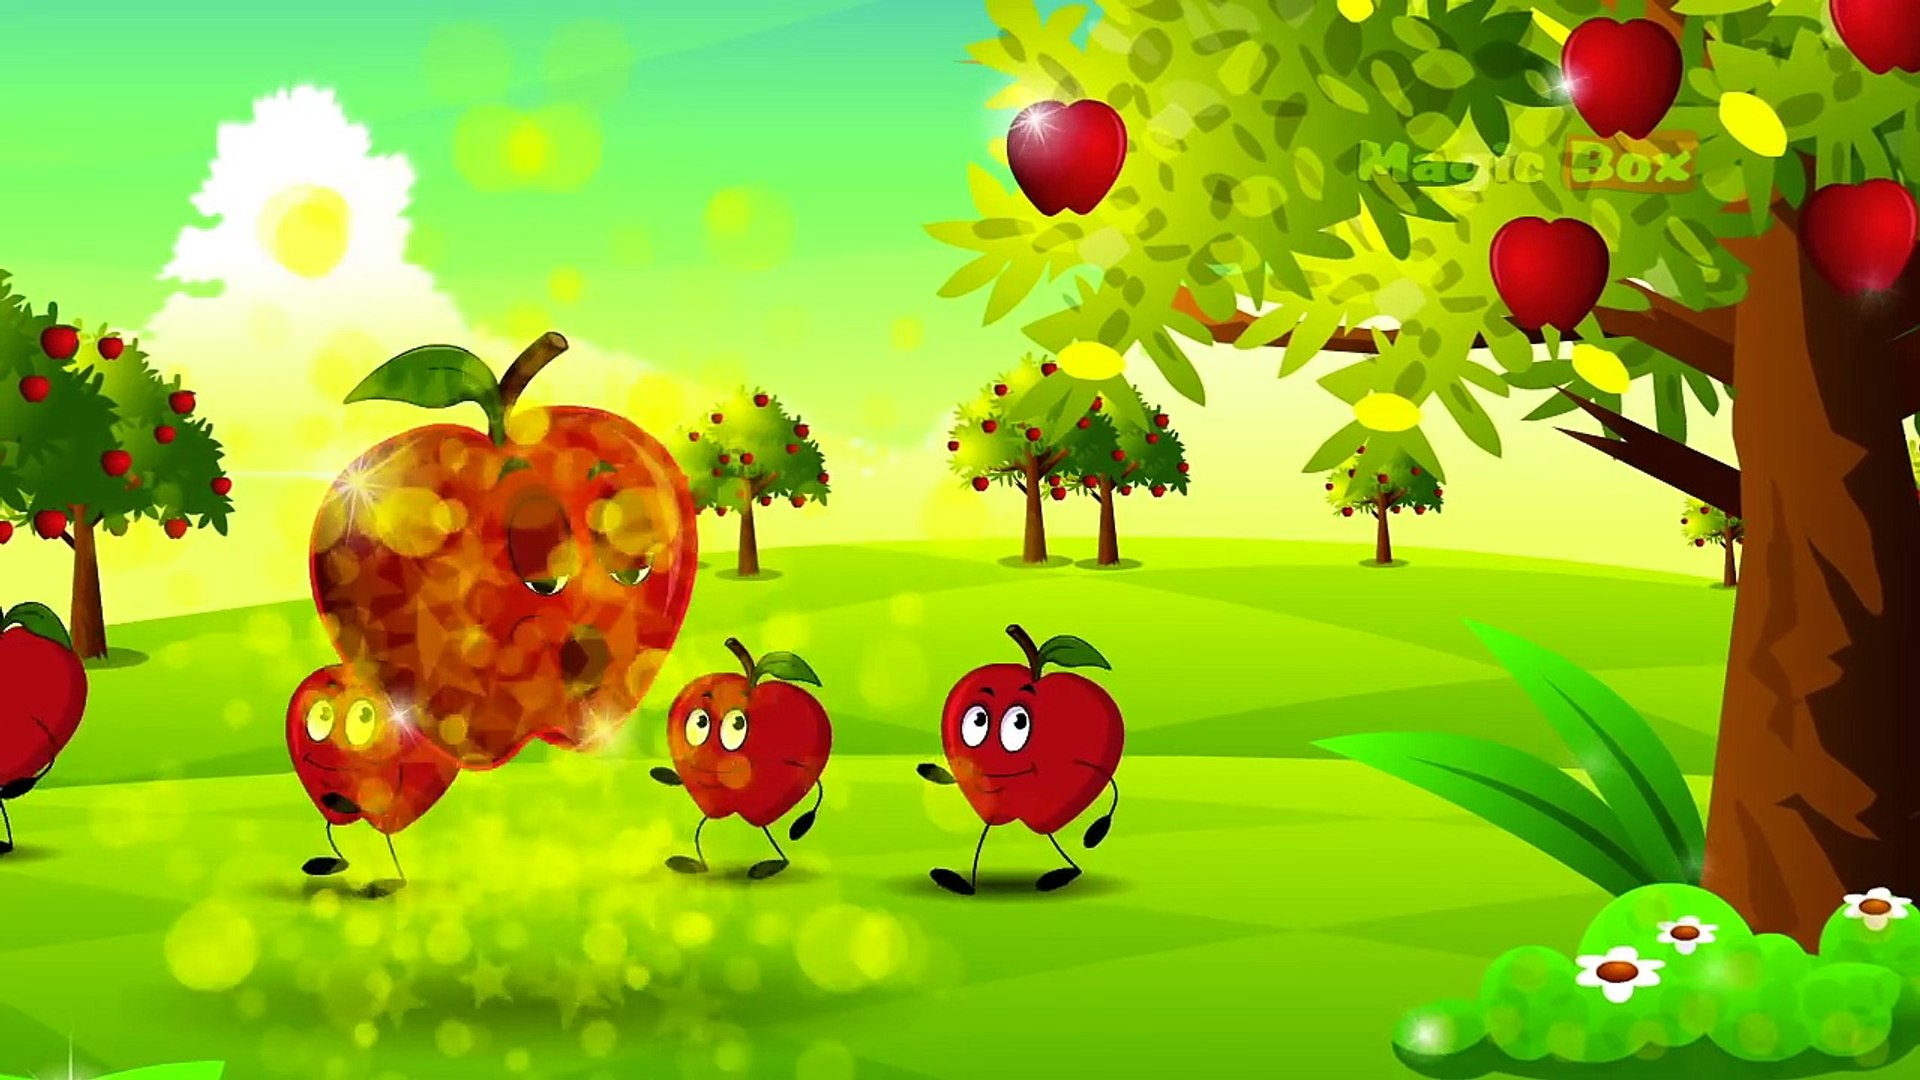 If I Were An Apple - English Nursery Rhymes - Cartoon/Animated Rhymes For Kids